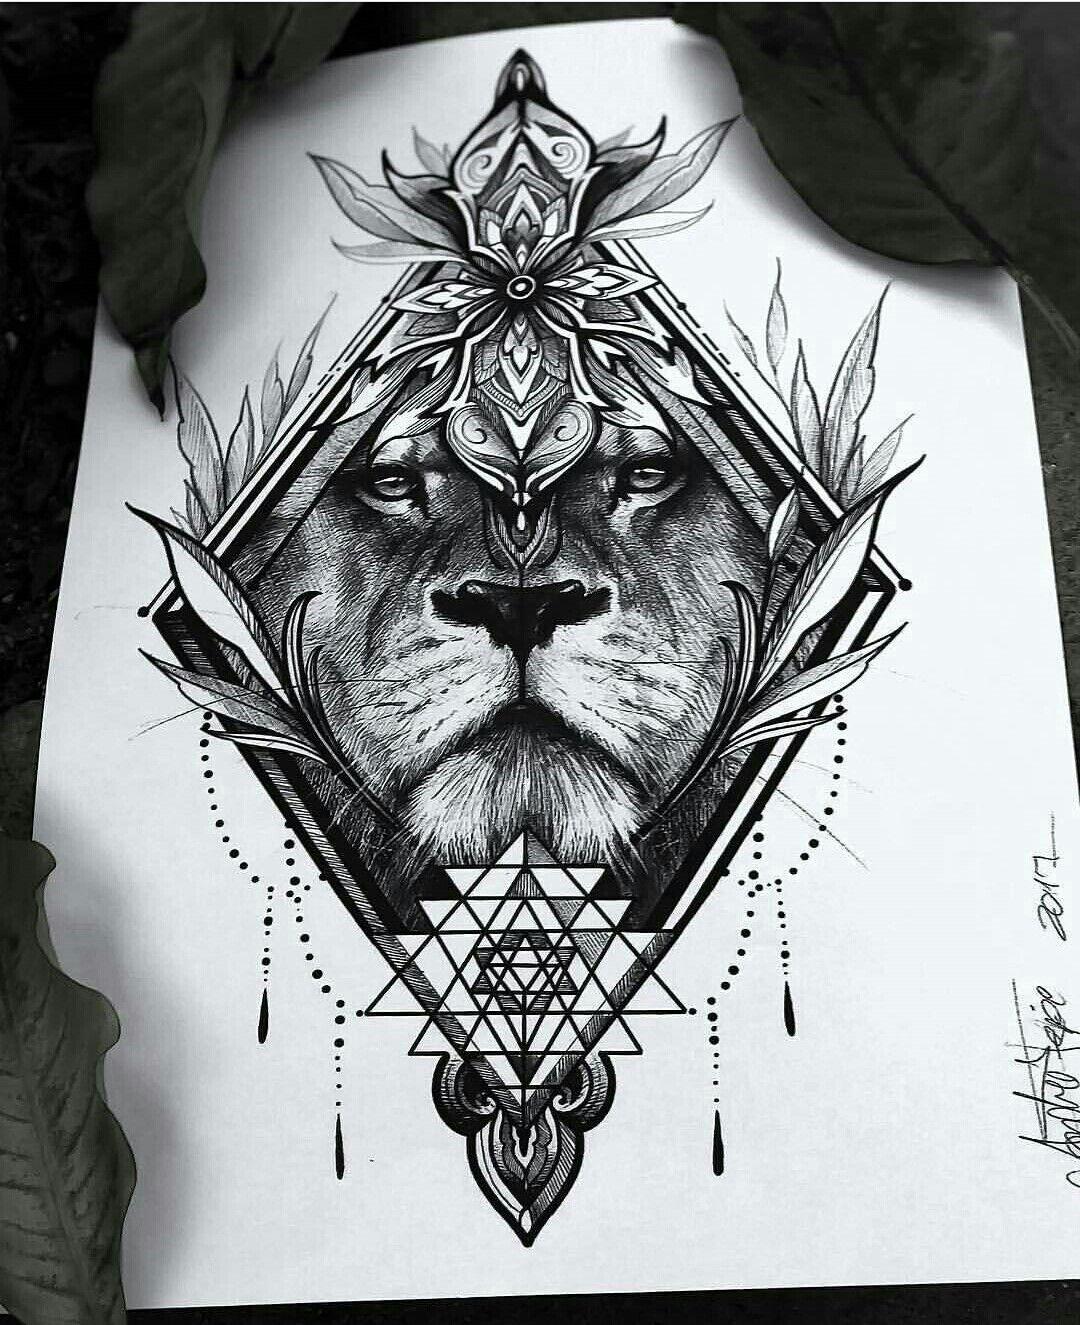 Black king tattoo ideas pin by sandra moreno moreno on tatuajes  pinterest  tattoo